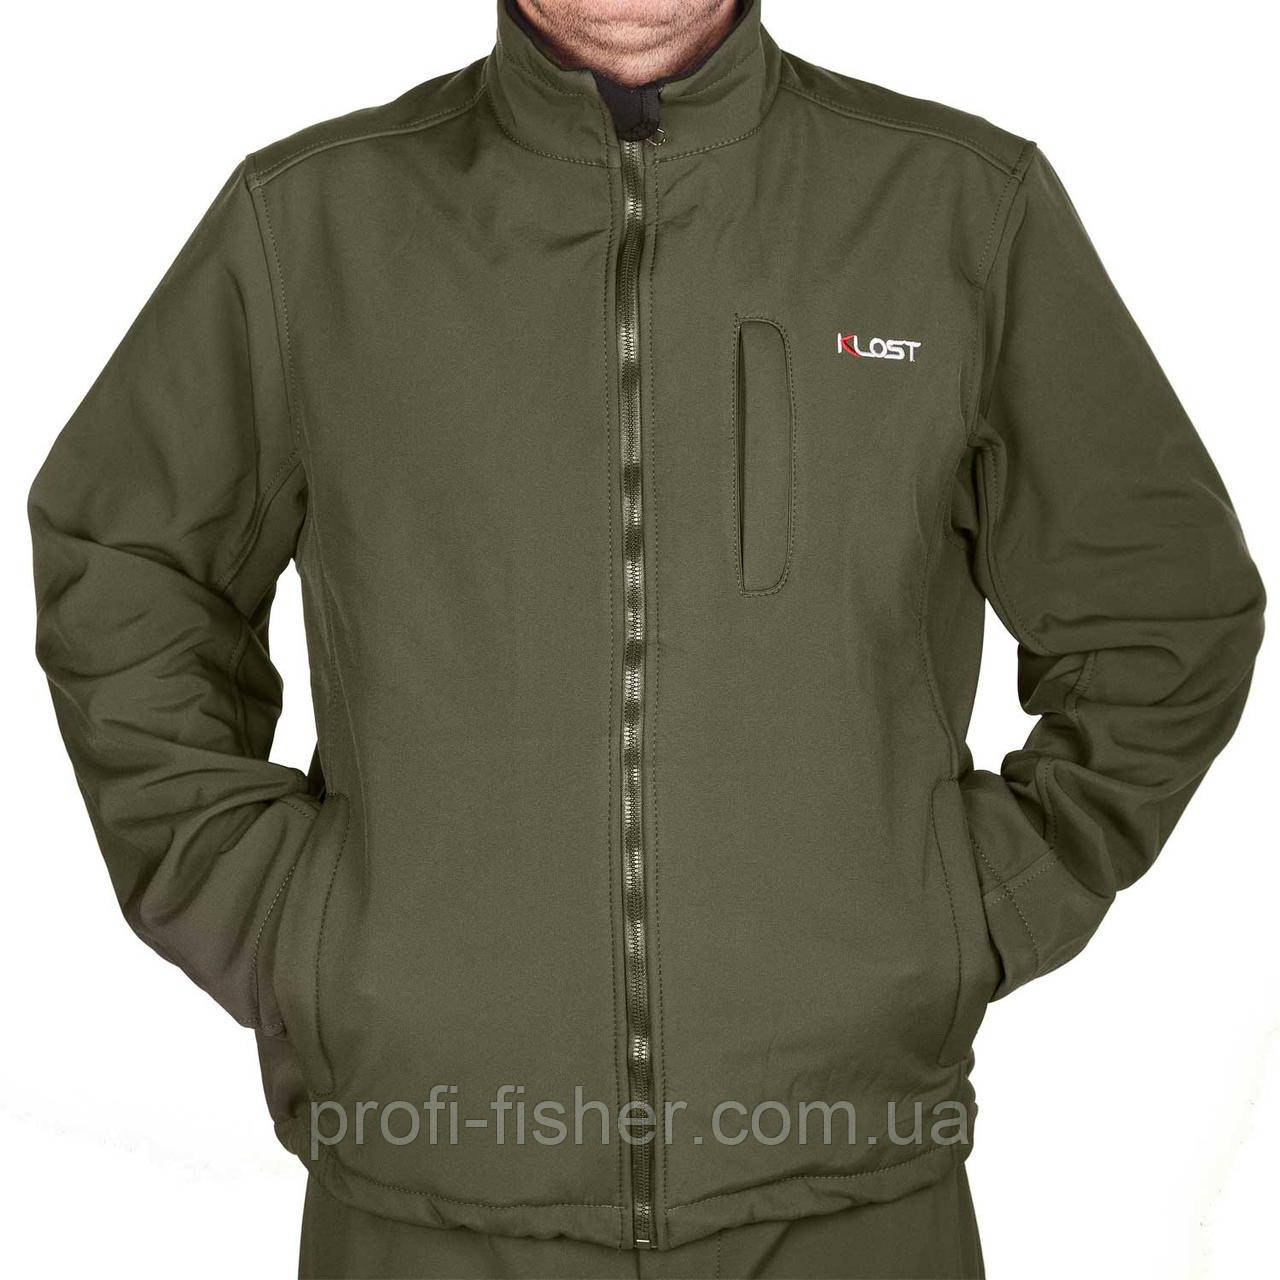 Куртка KLOST Soft Shell Тур 5010 XXL Khaki